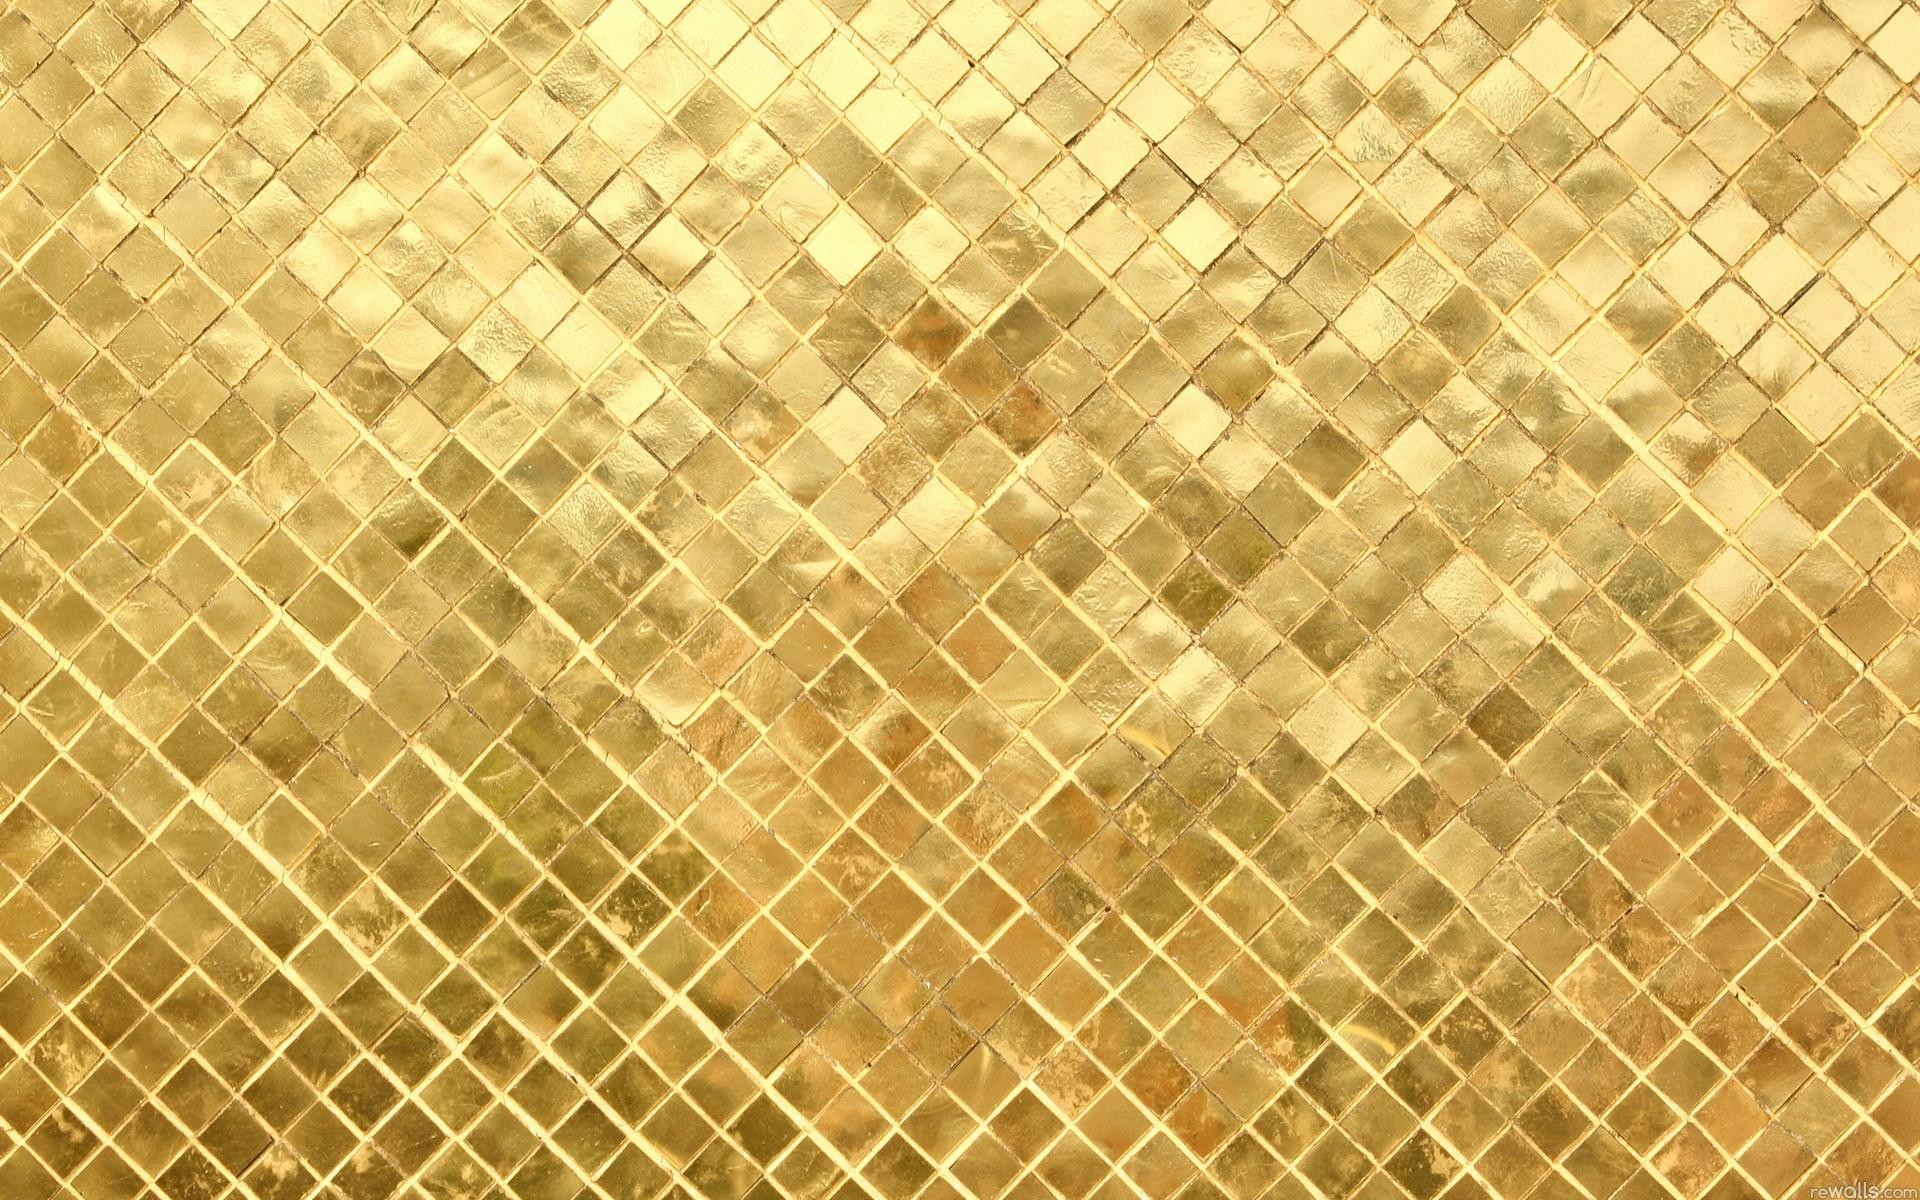 Gold Glitter Wallpaper Hd Free Download Cool Images - Gold Background , HD Wallpaper & Backgrounds